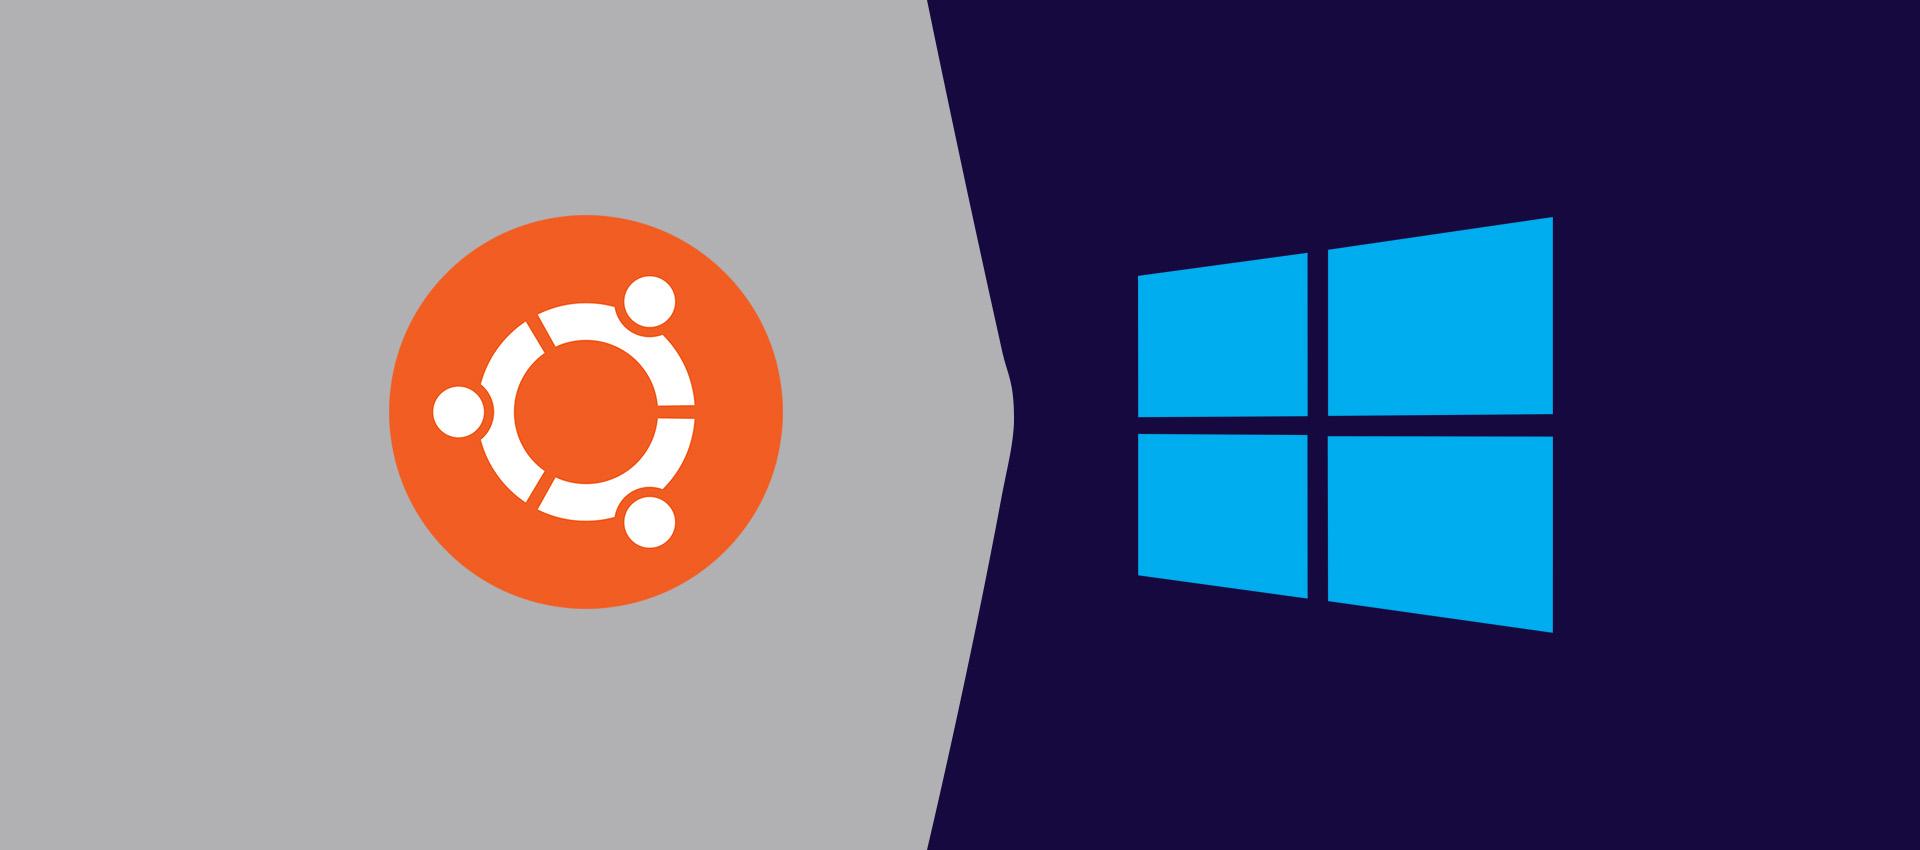 How To Fix Windows MBR Using Ubuntu Live CD or USB